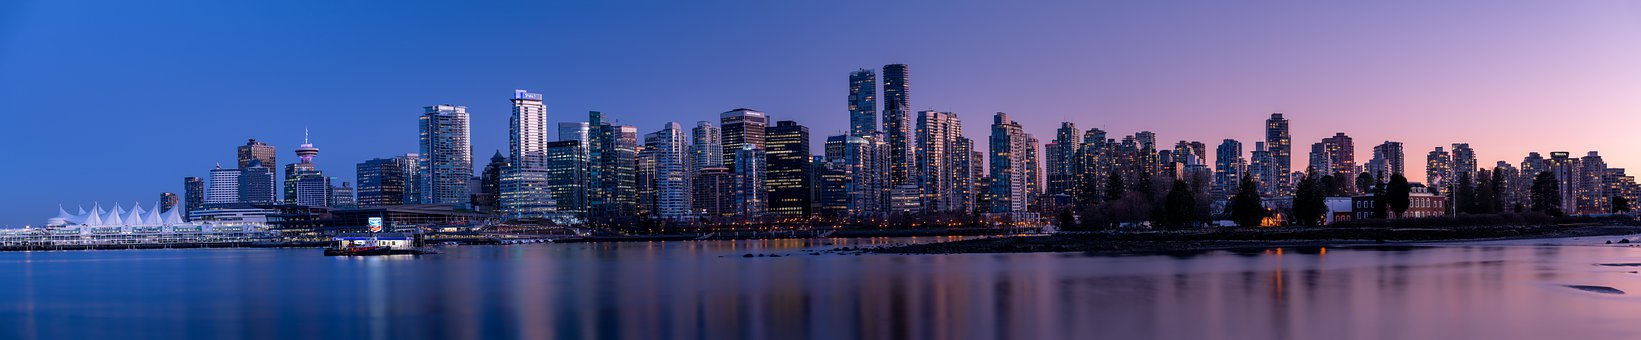 Buildings, Harbor, Skyline, Cityscape, Skyscrapers